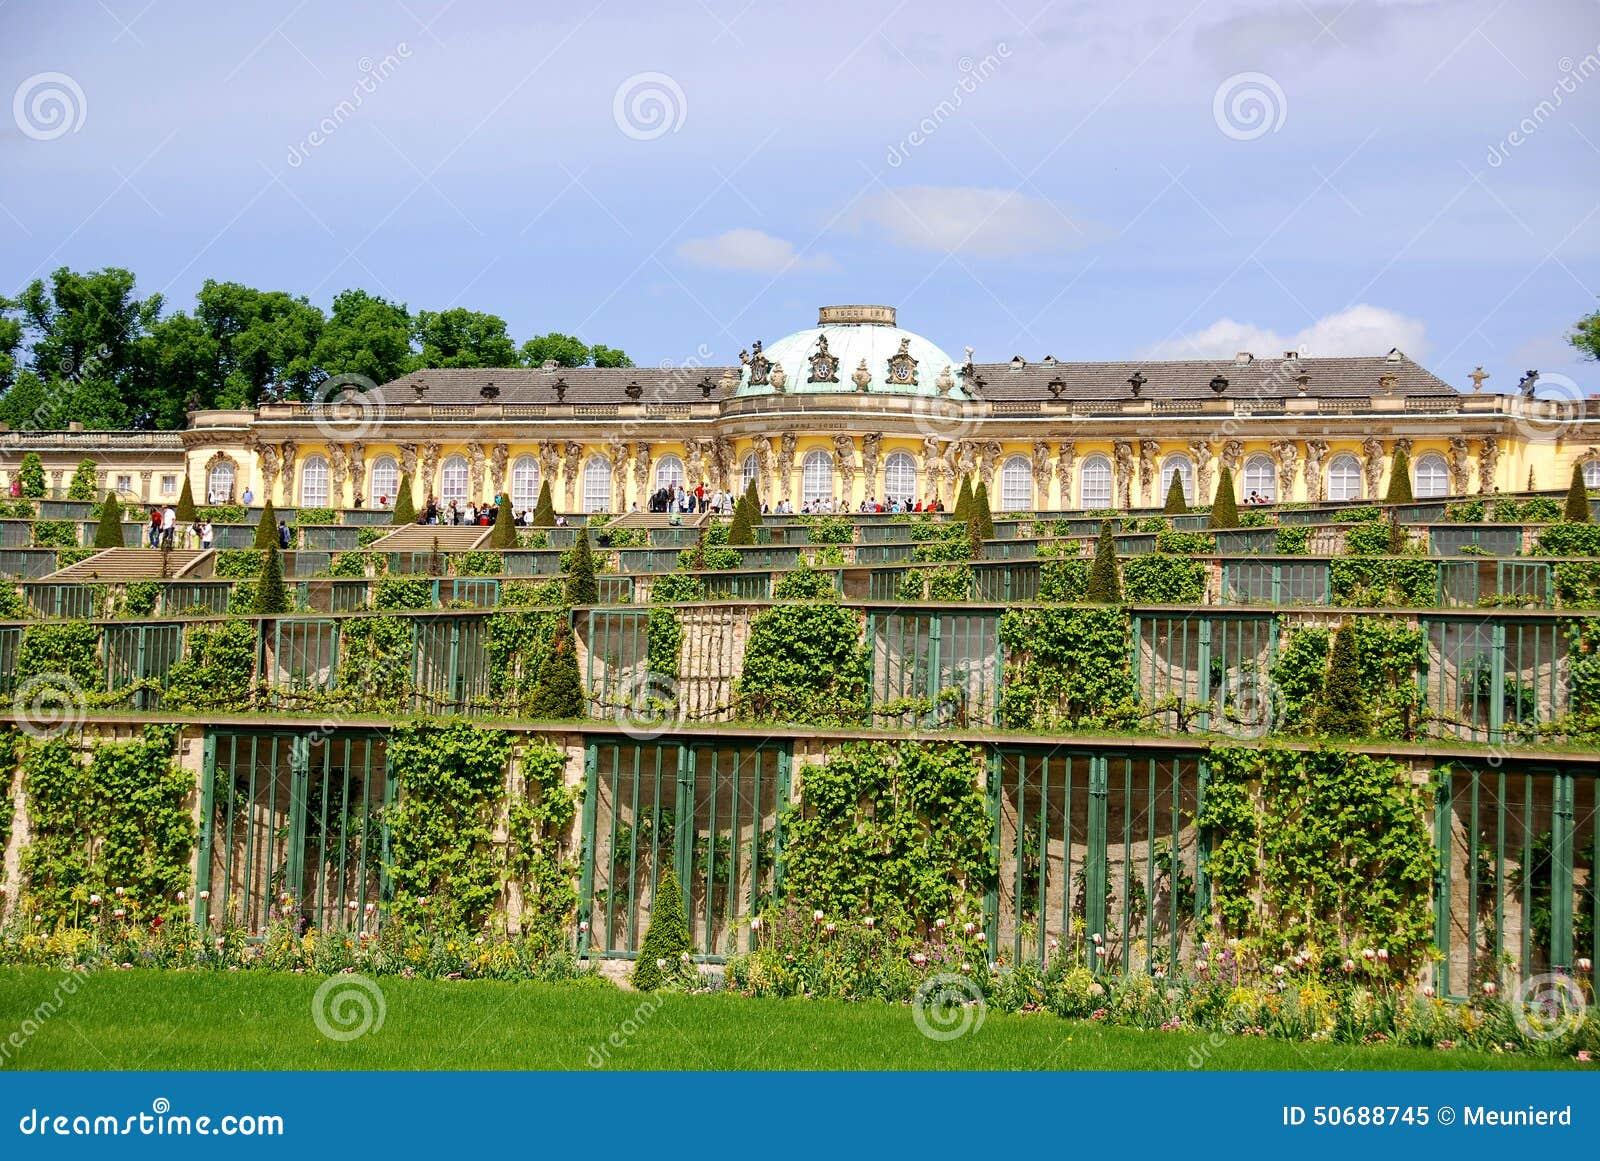 Download Sanssouci 库存图片. 图片 包括有 在附近, 有历史, 绿色, 名字, 庭院, 巡回表演者, brandon - 50688745